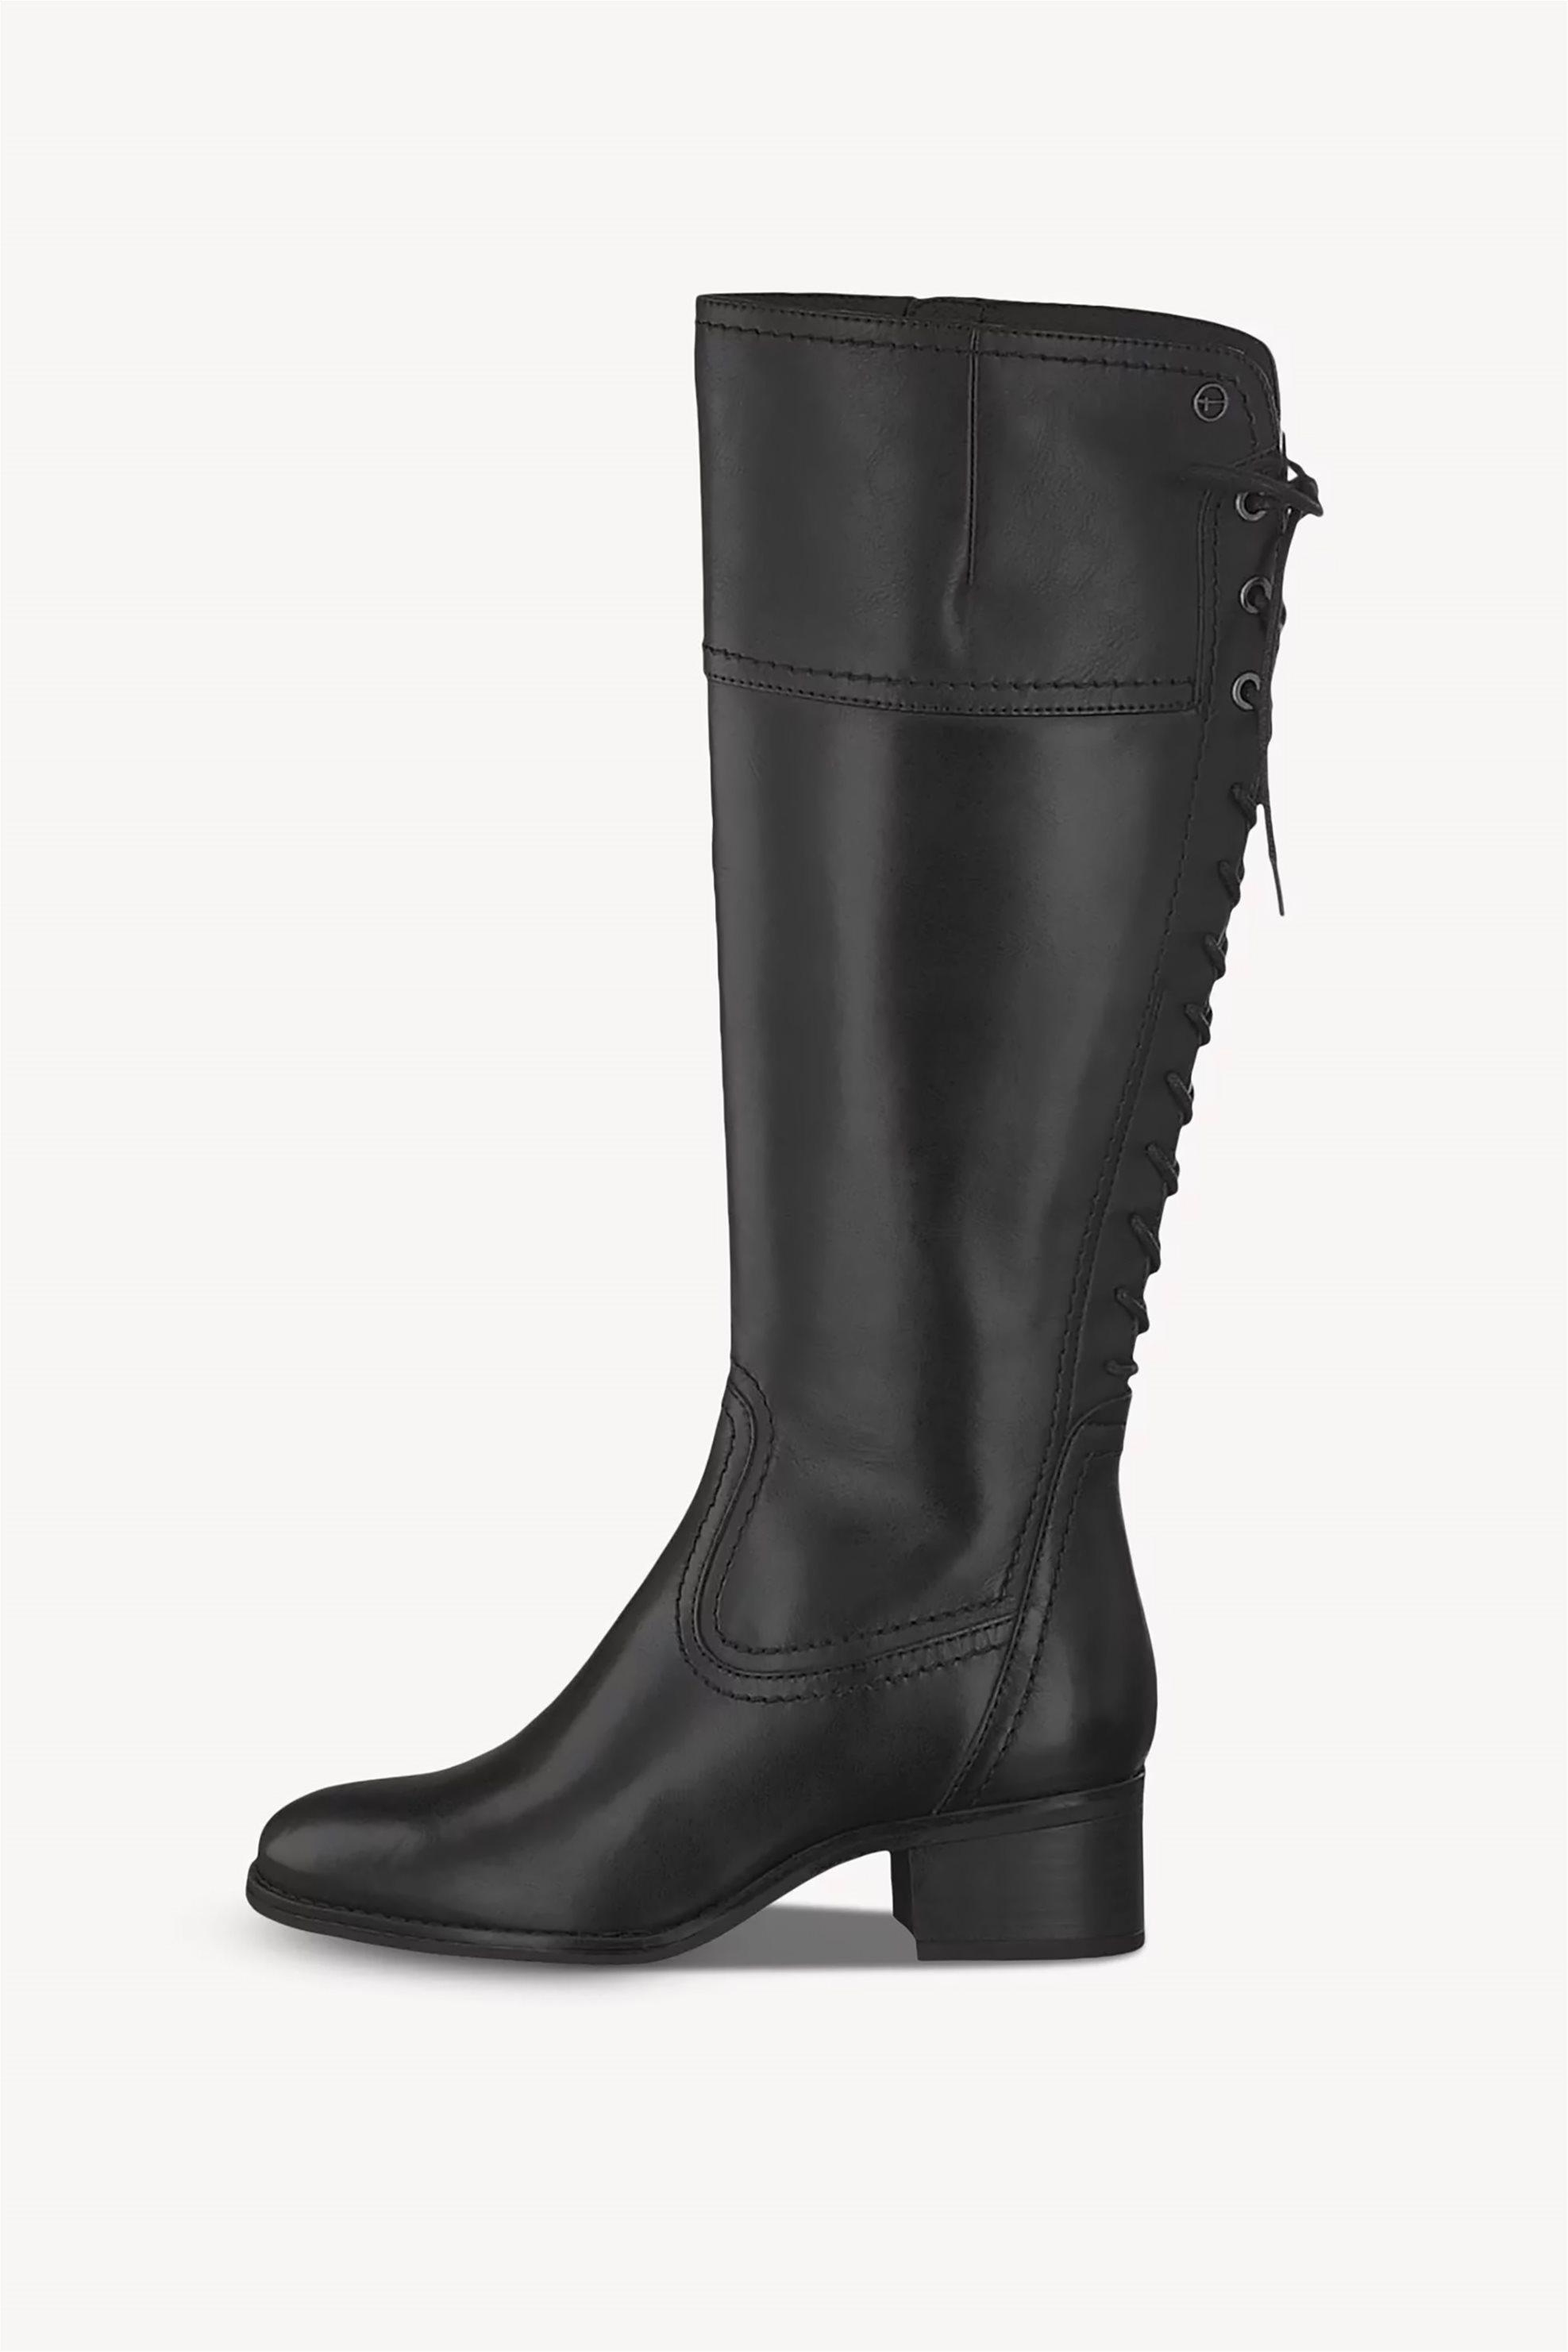 Tamaris γυναικείες μπότες με κορδόνια πίσω και κροκό τελείωμα – 1-1-25543-23 – Μαύρο